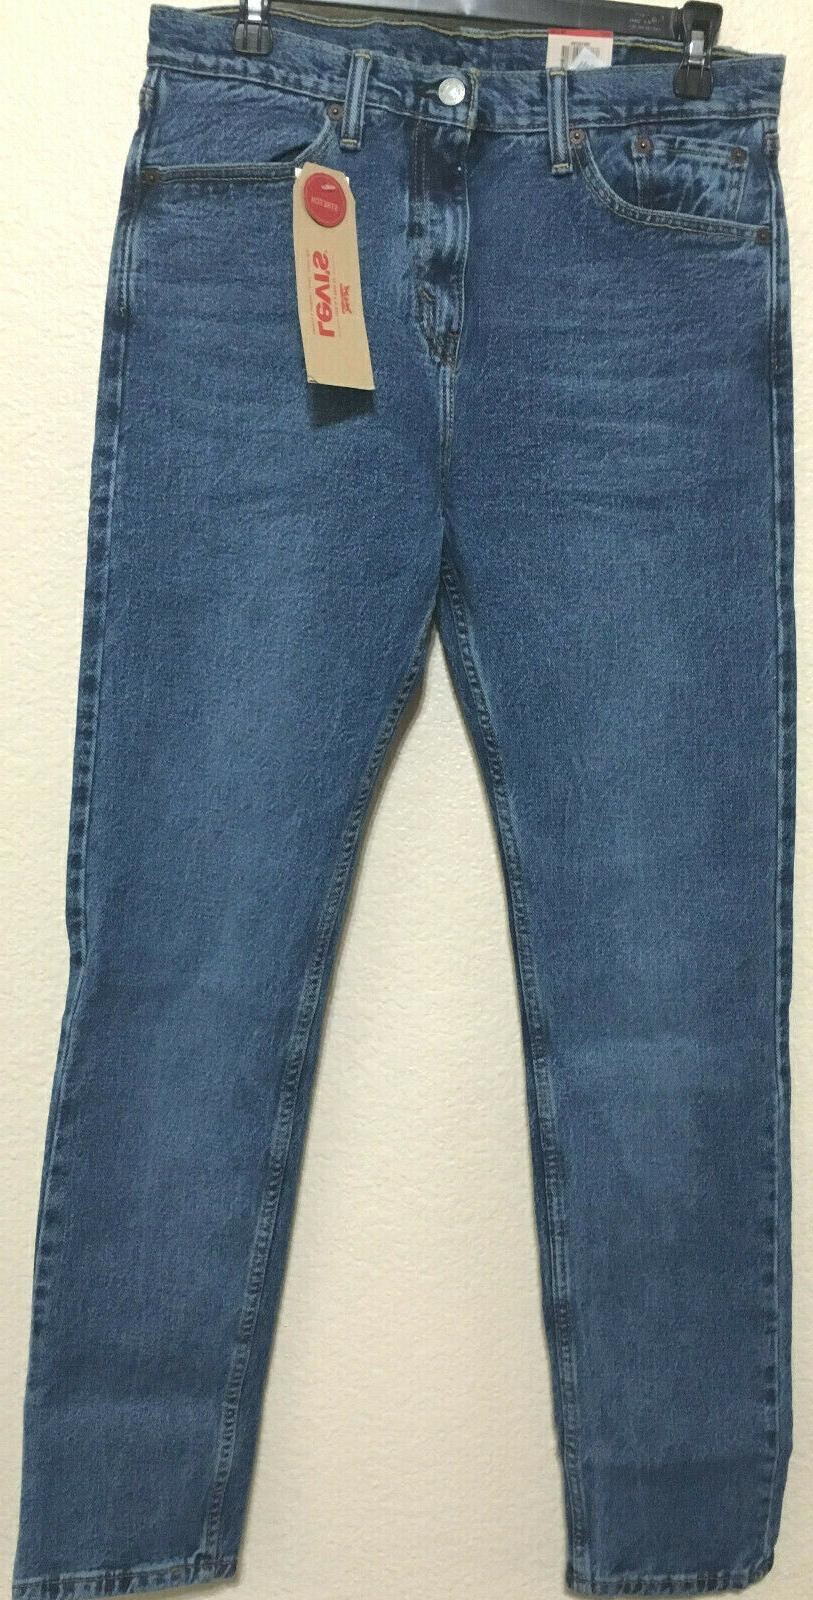 NWT MEN'S LEVI'S 0786 SKINNY AT BLUE PANT $70